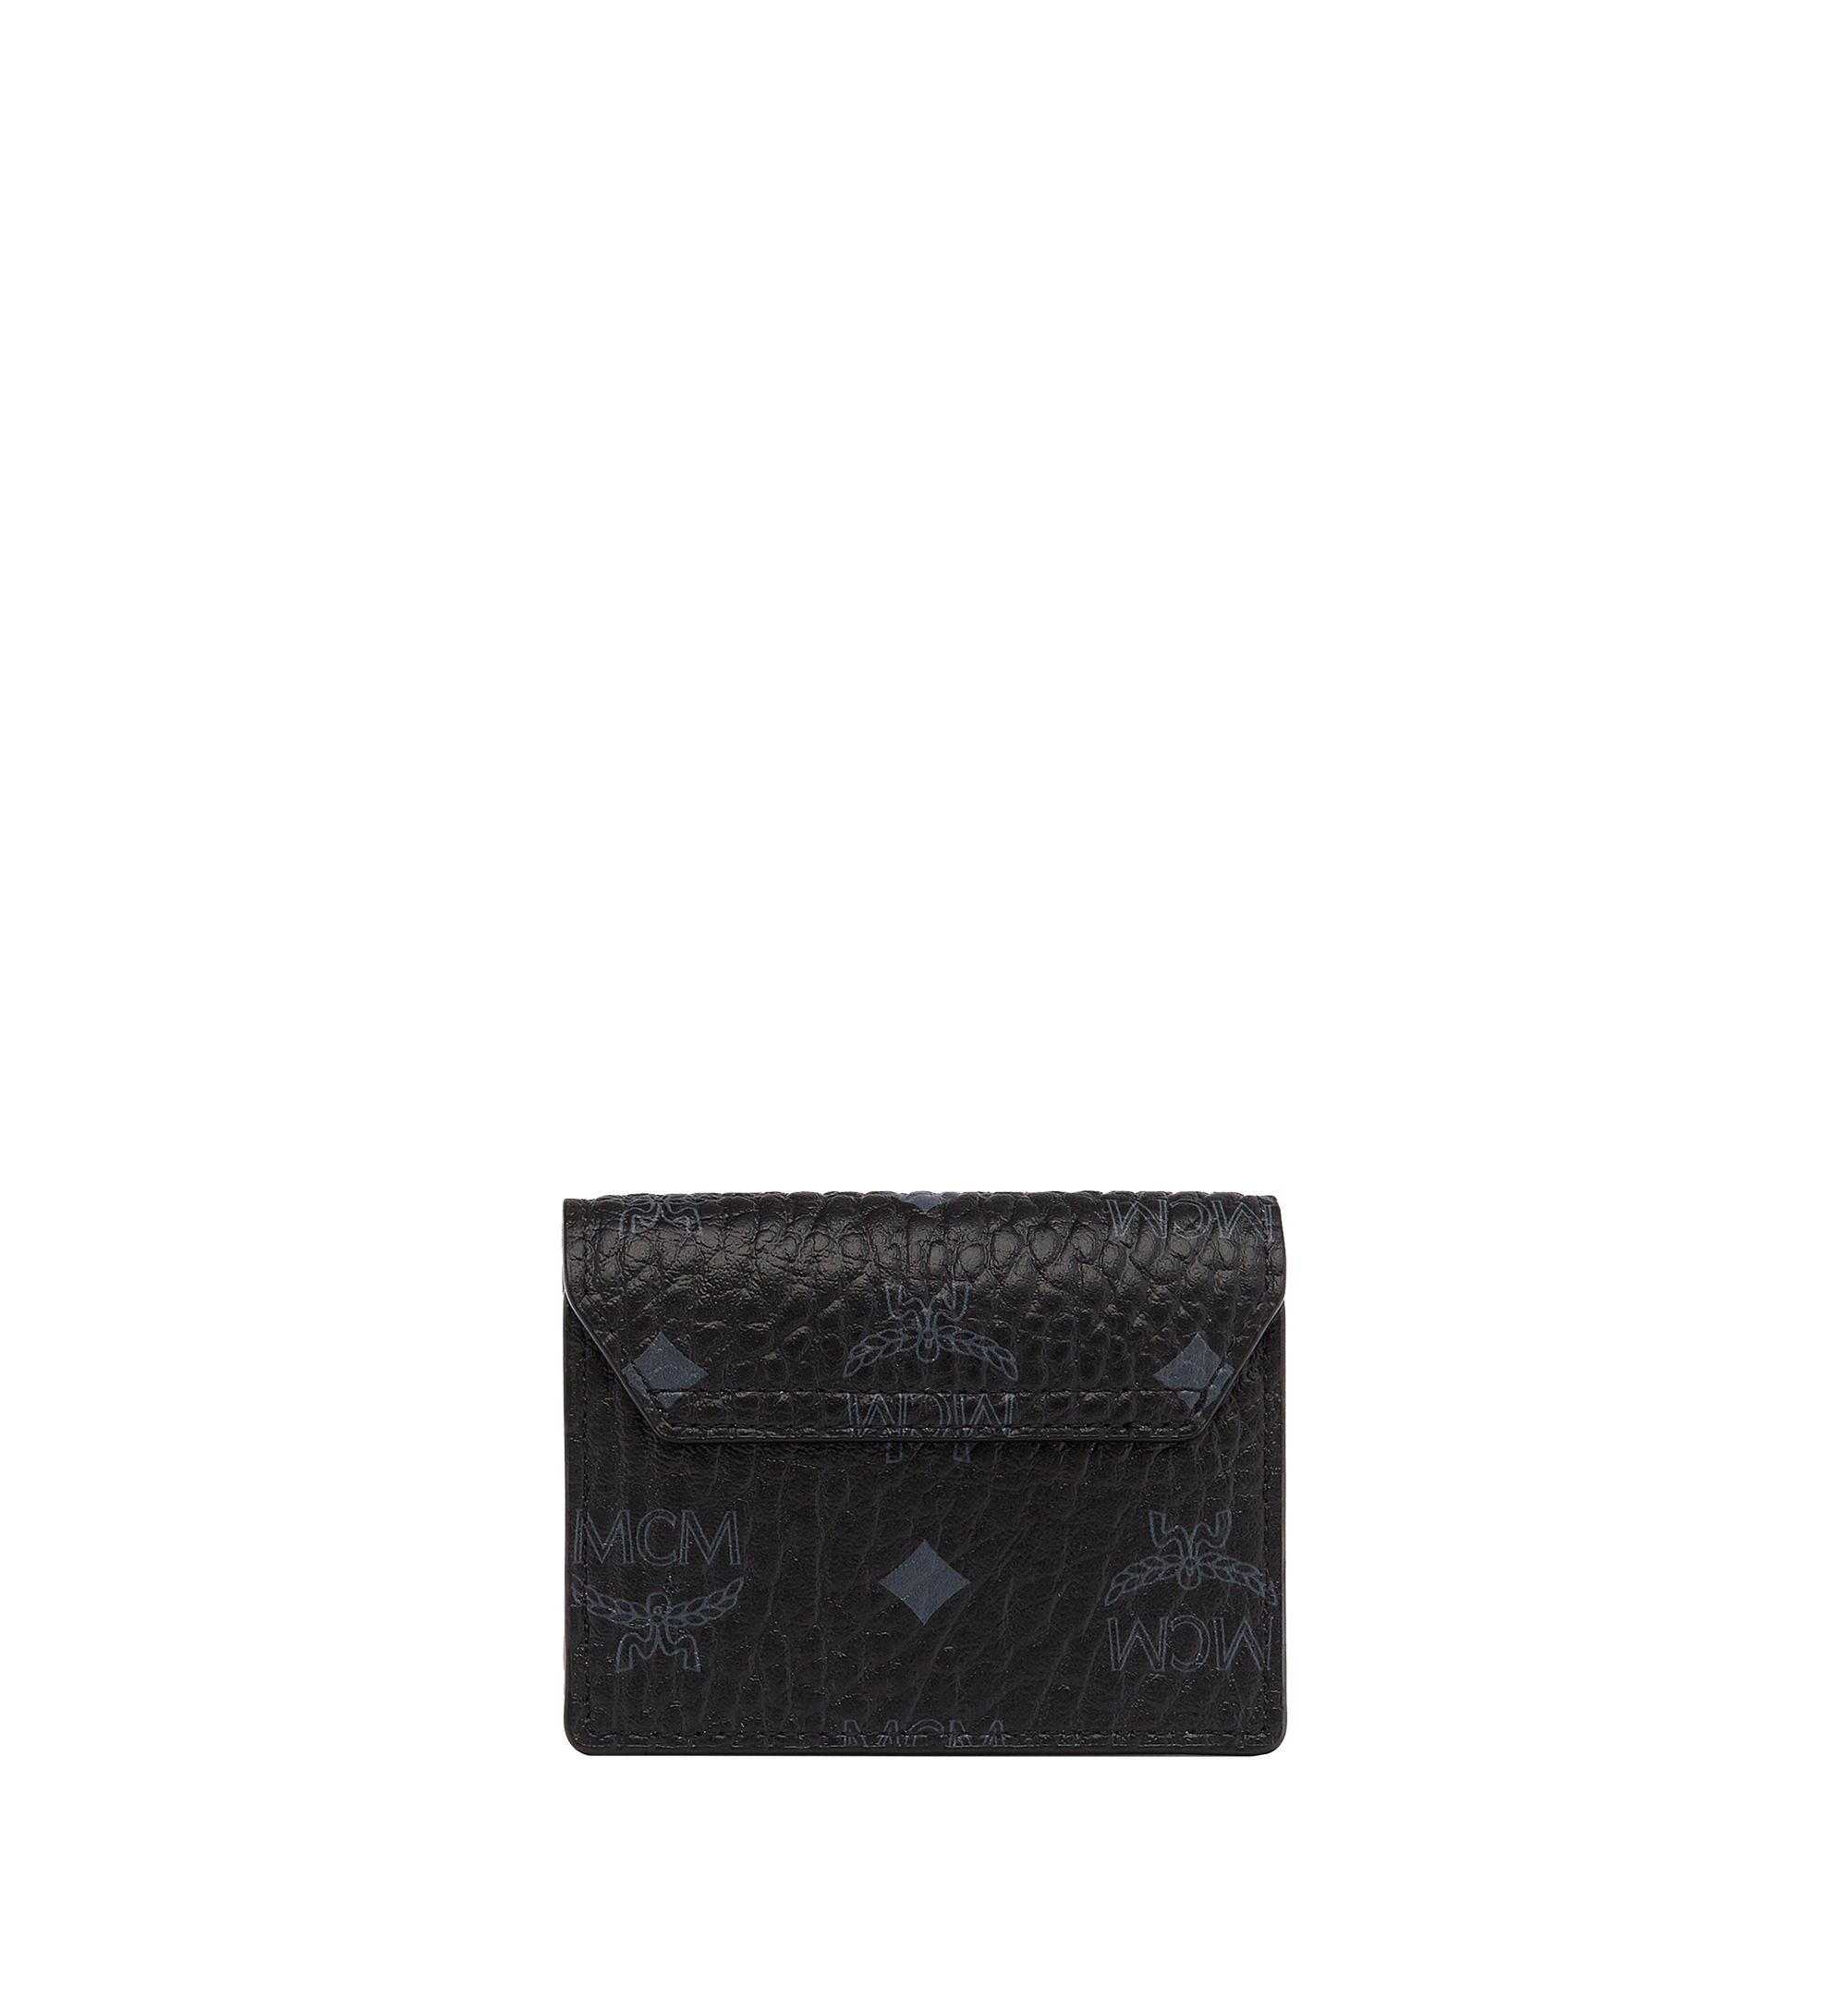 MCM Patricia Accordion Card Case in Visetos Black MYA7SPA14BK001 Alternate View 2